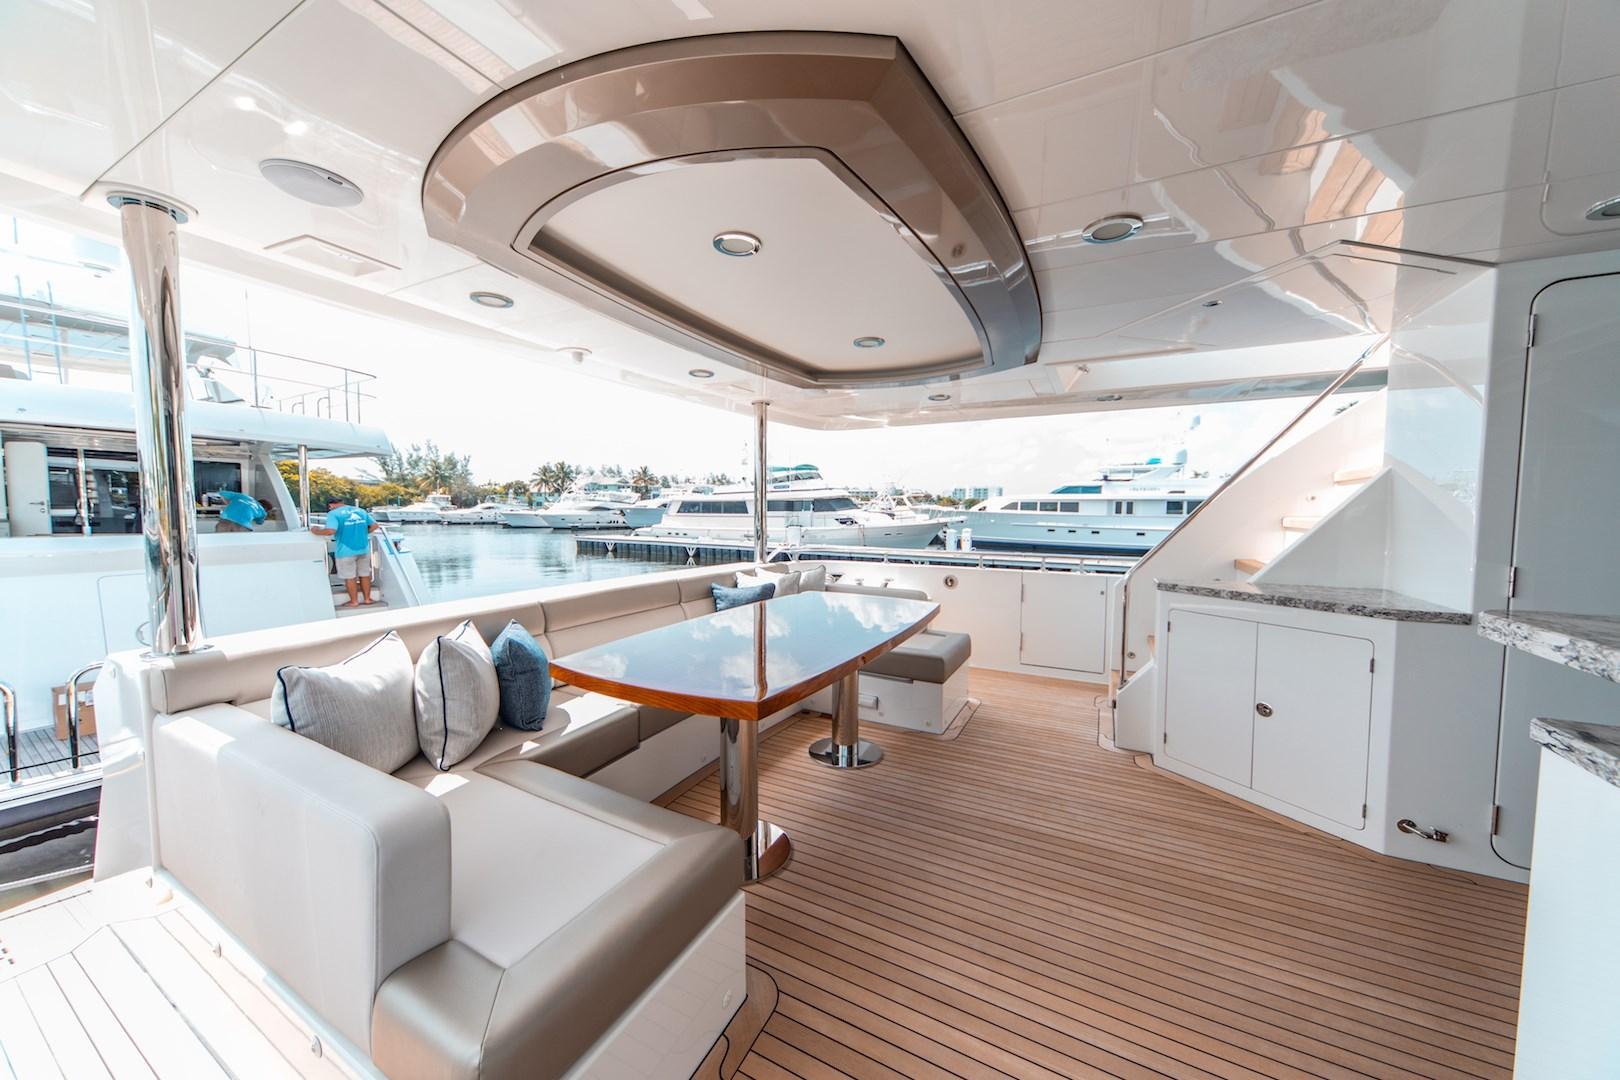 2019 Ocean Alexander 88 Motoryacht Image Thumbnail #2